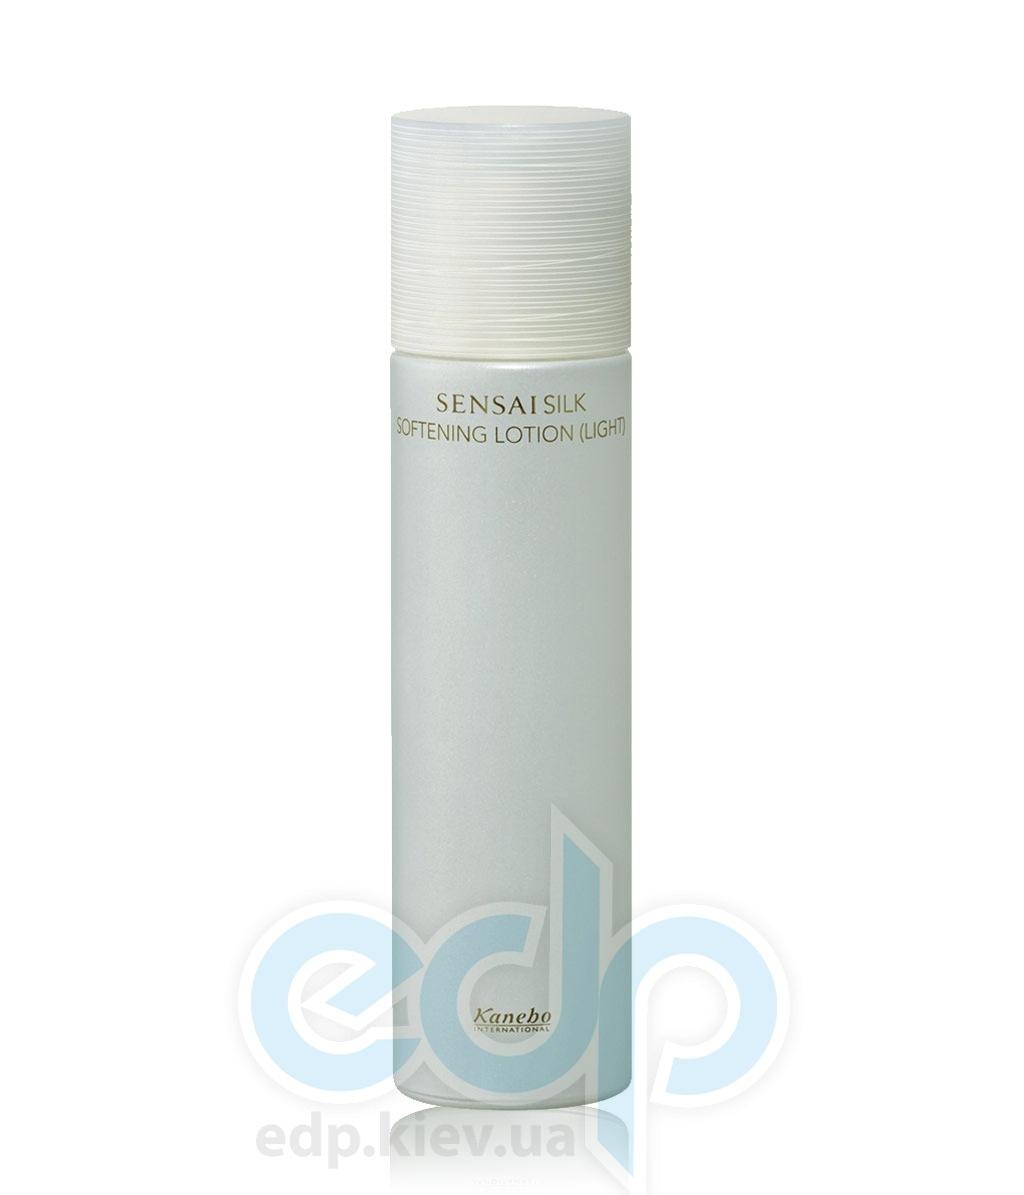 Kanebo Лосьон увлажняющий - Sensai Silk Softenig Lotion - 125 ml